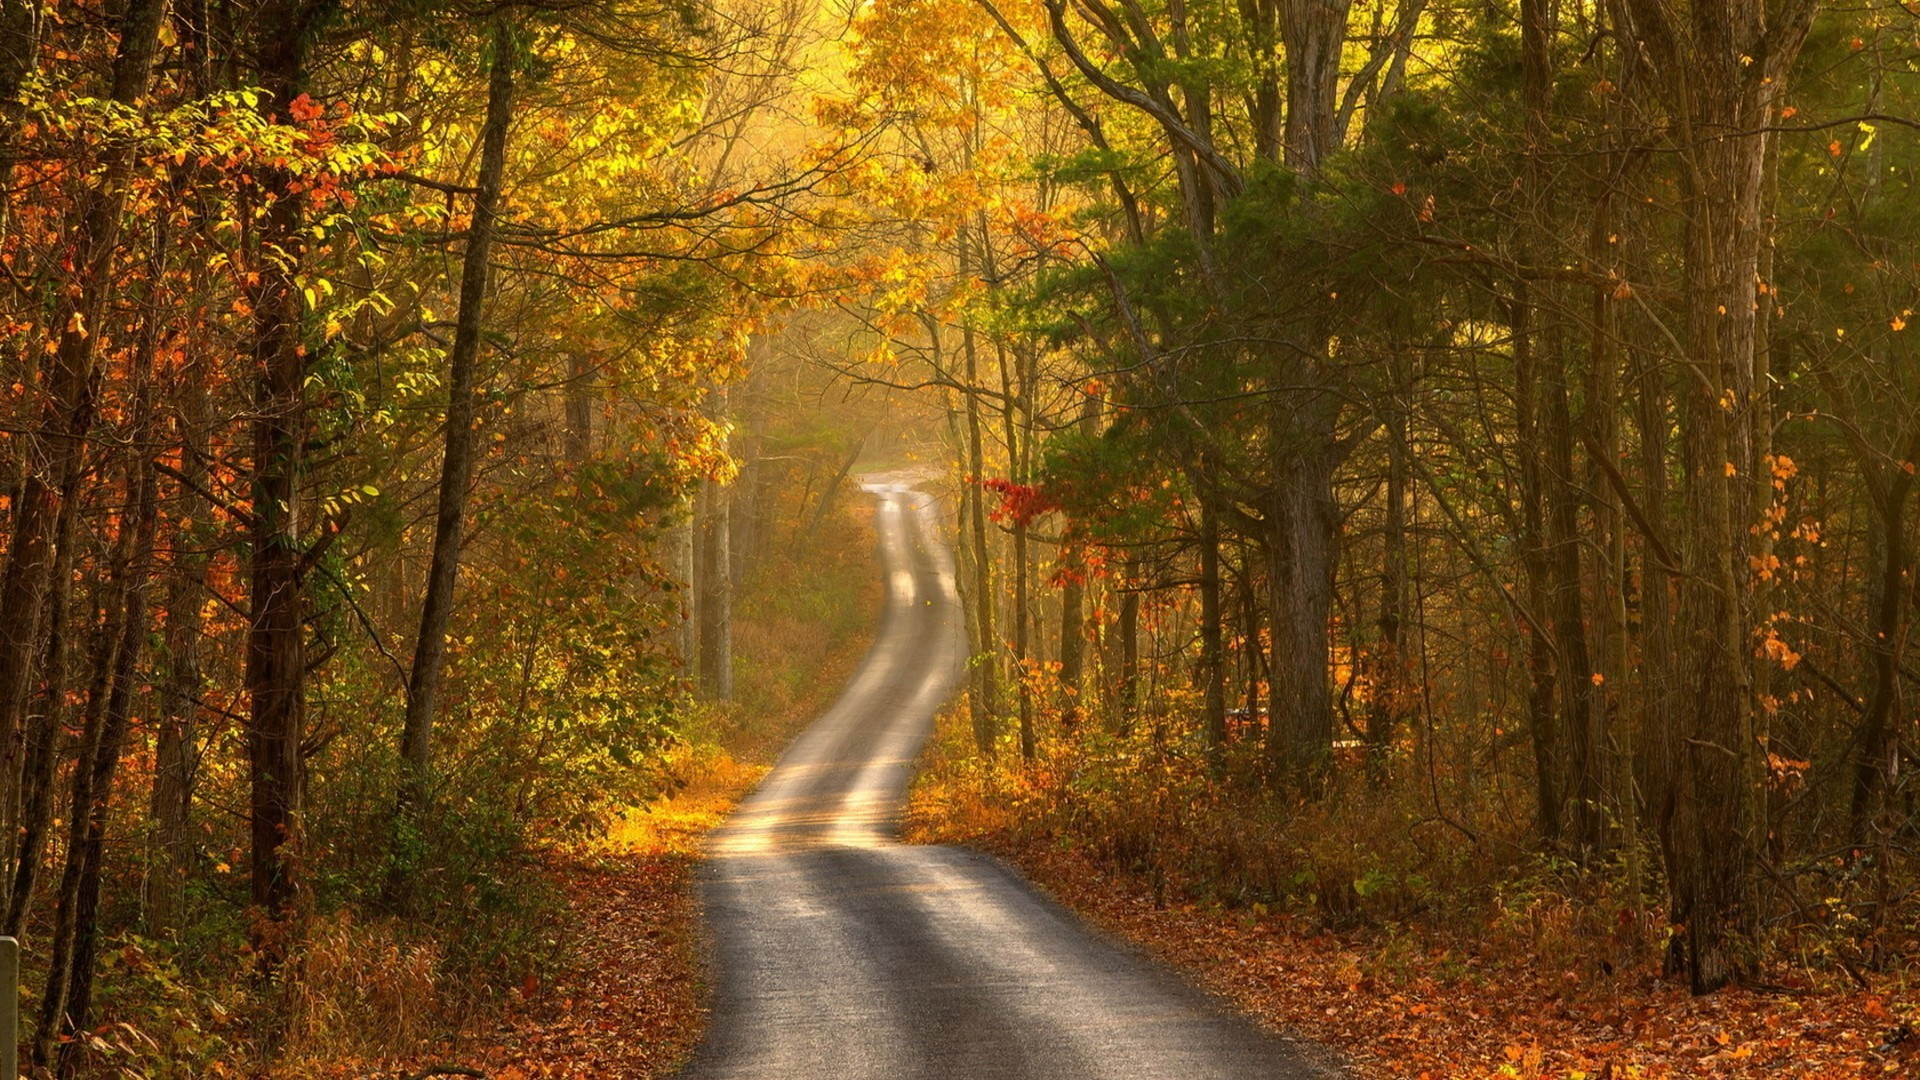 Осень лес дорога природа пейзаж